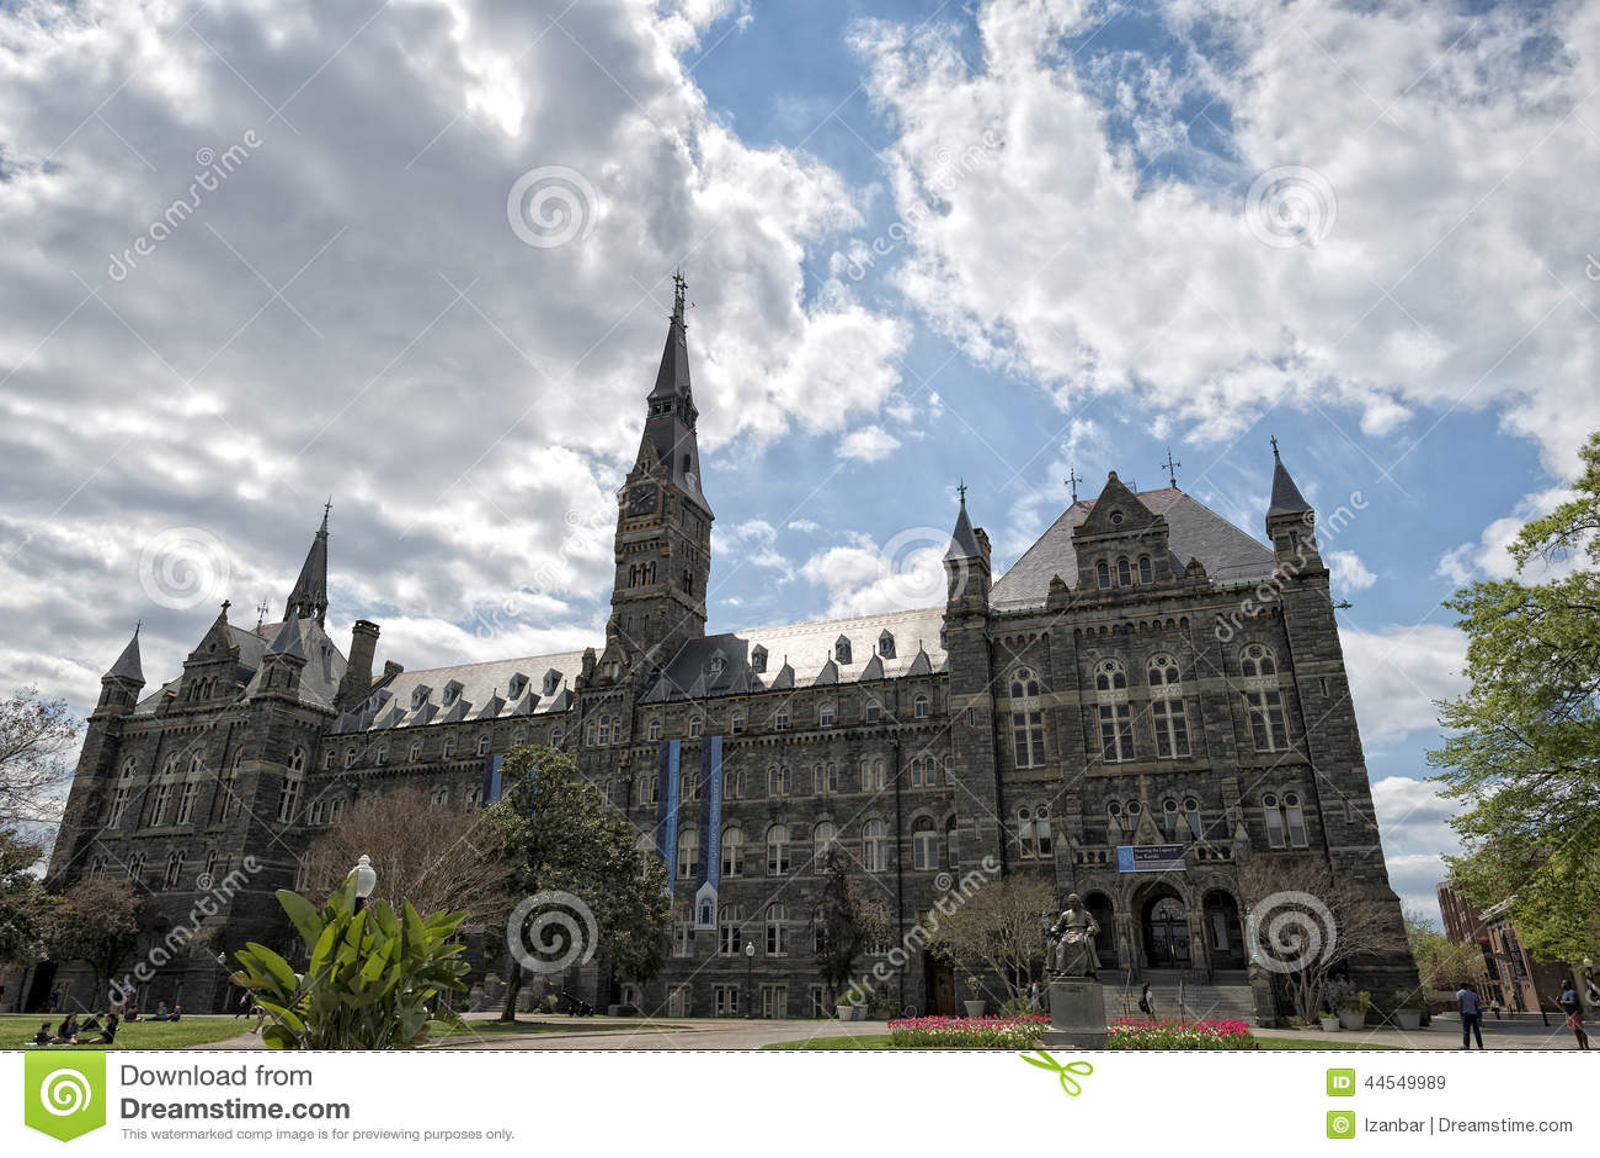 Uniwersytet Georgetown w washington dc